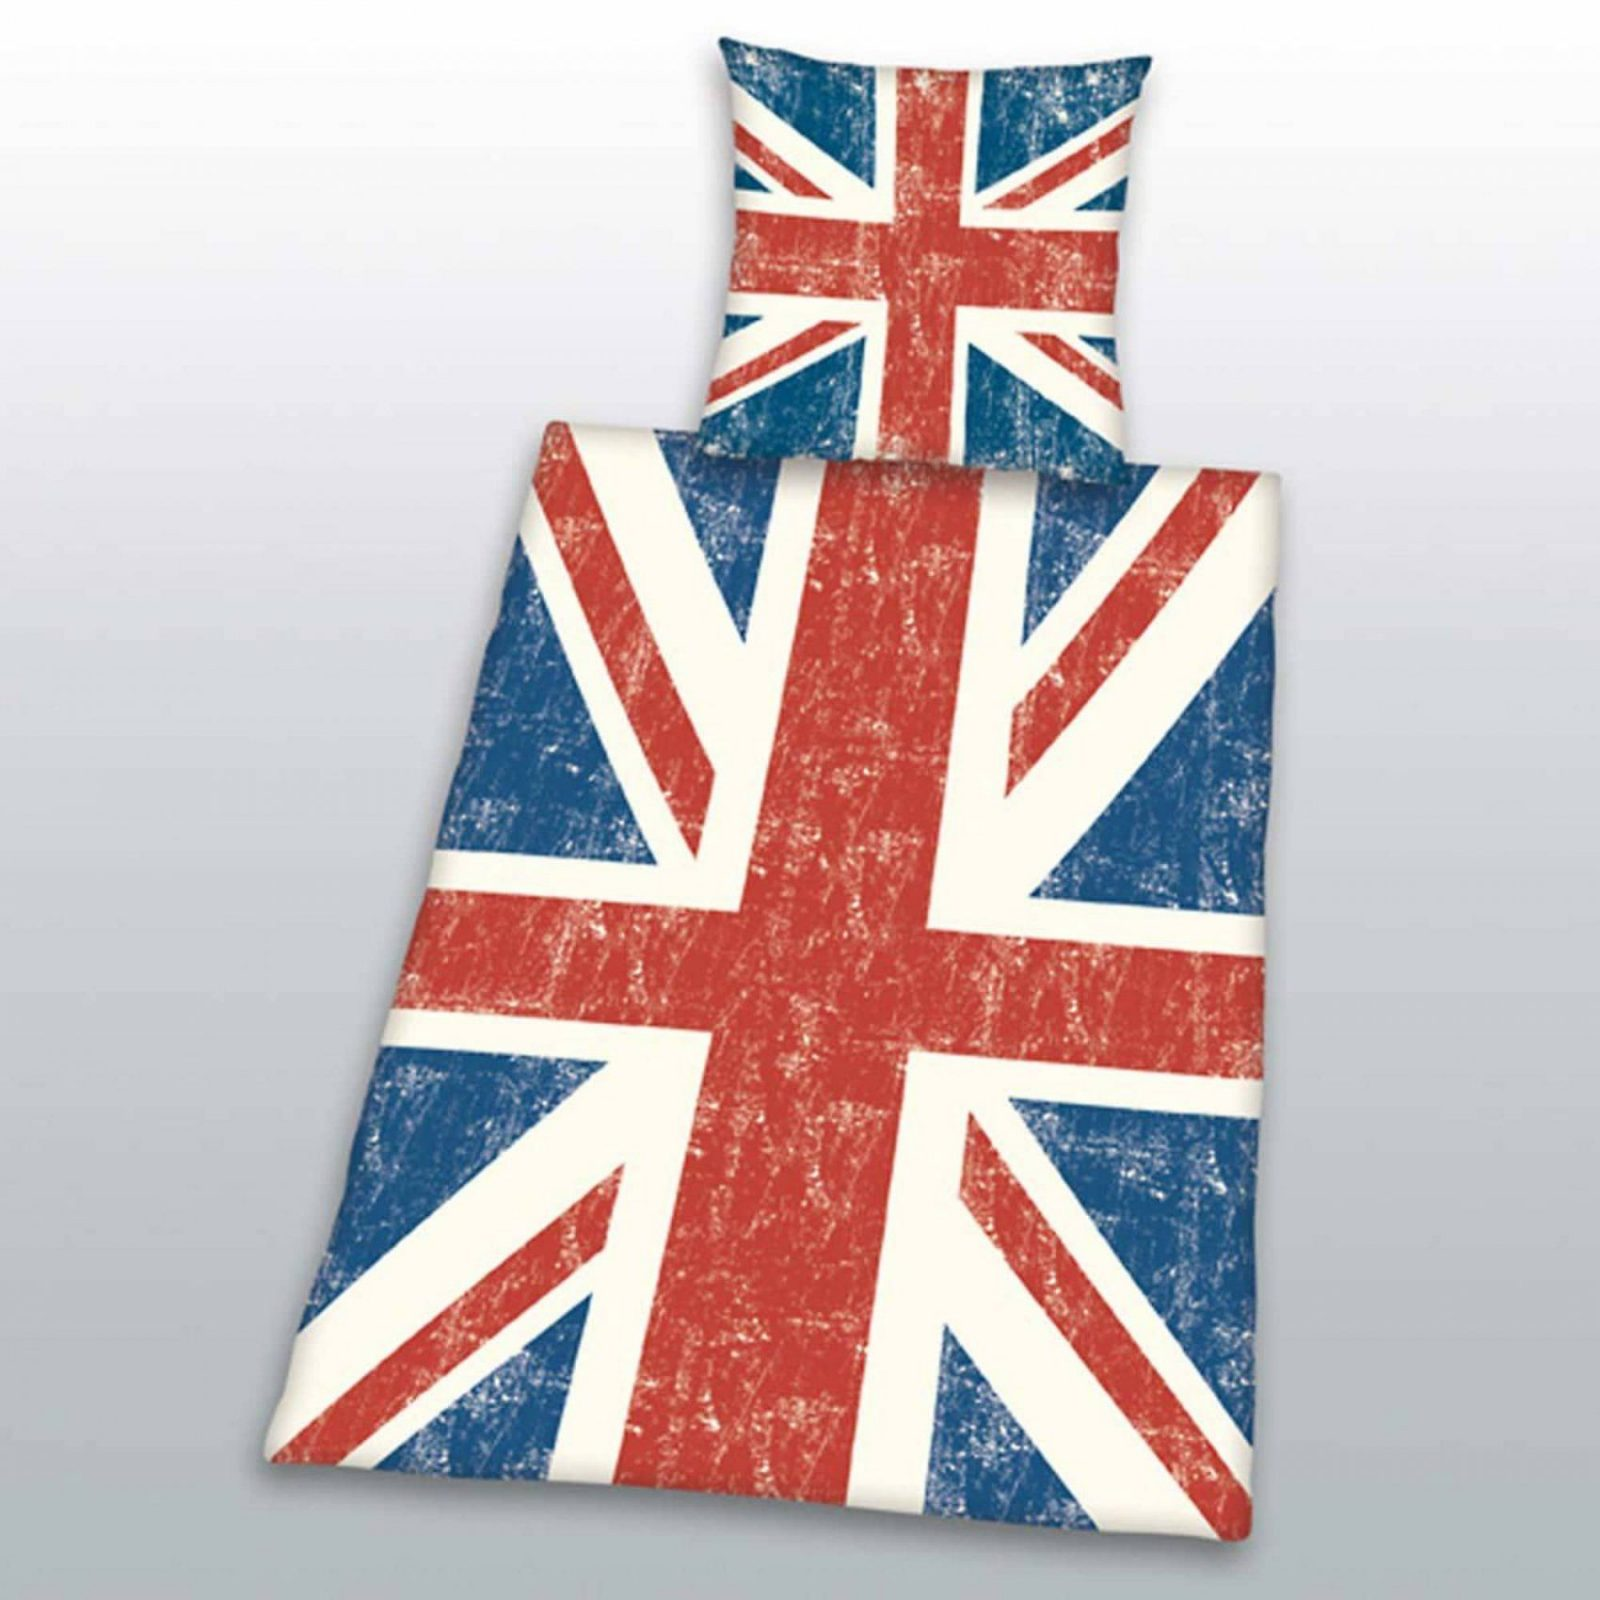 Bettwäsche Union Jack Ökotex Baumwolle Linon von Bettwäsche Union Jack Bild